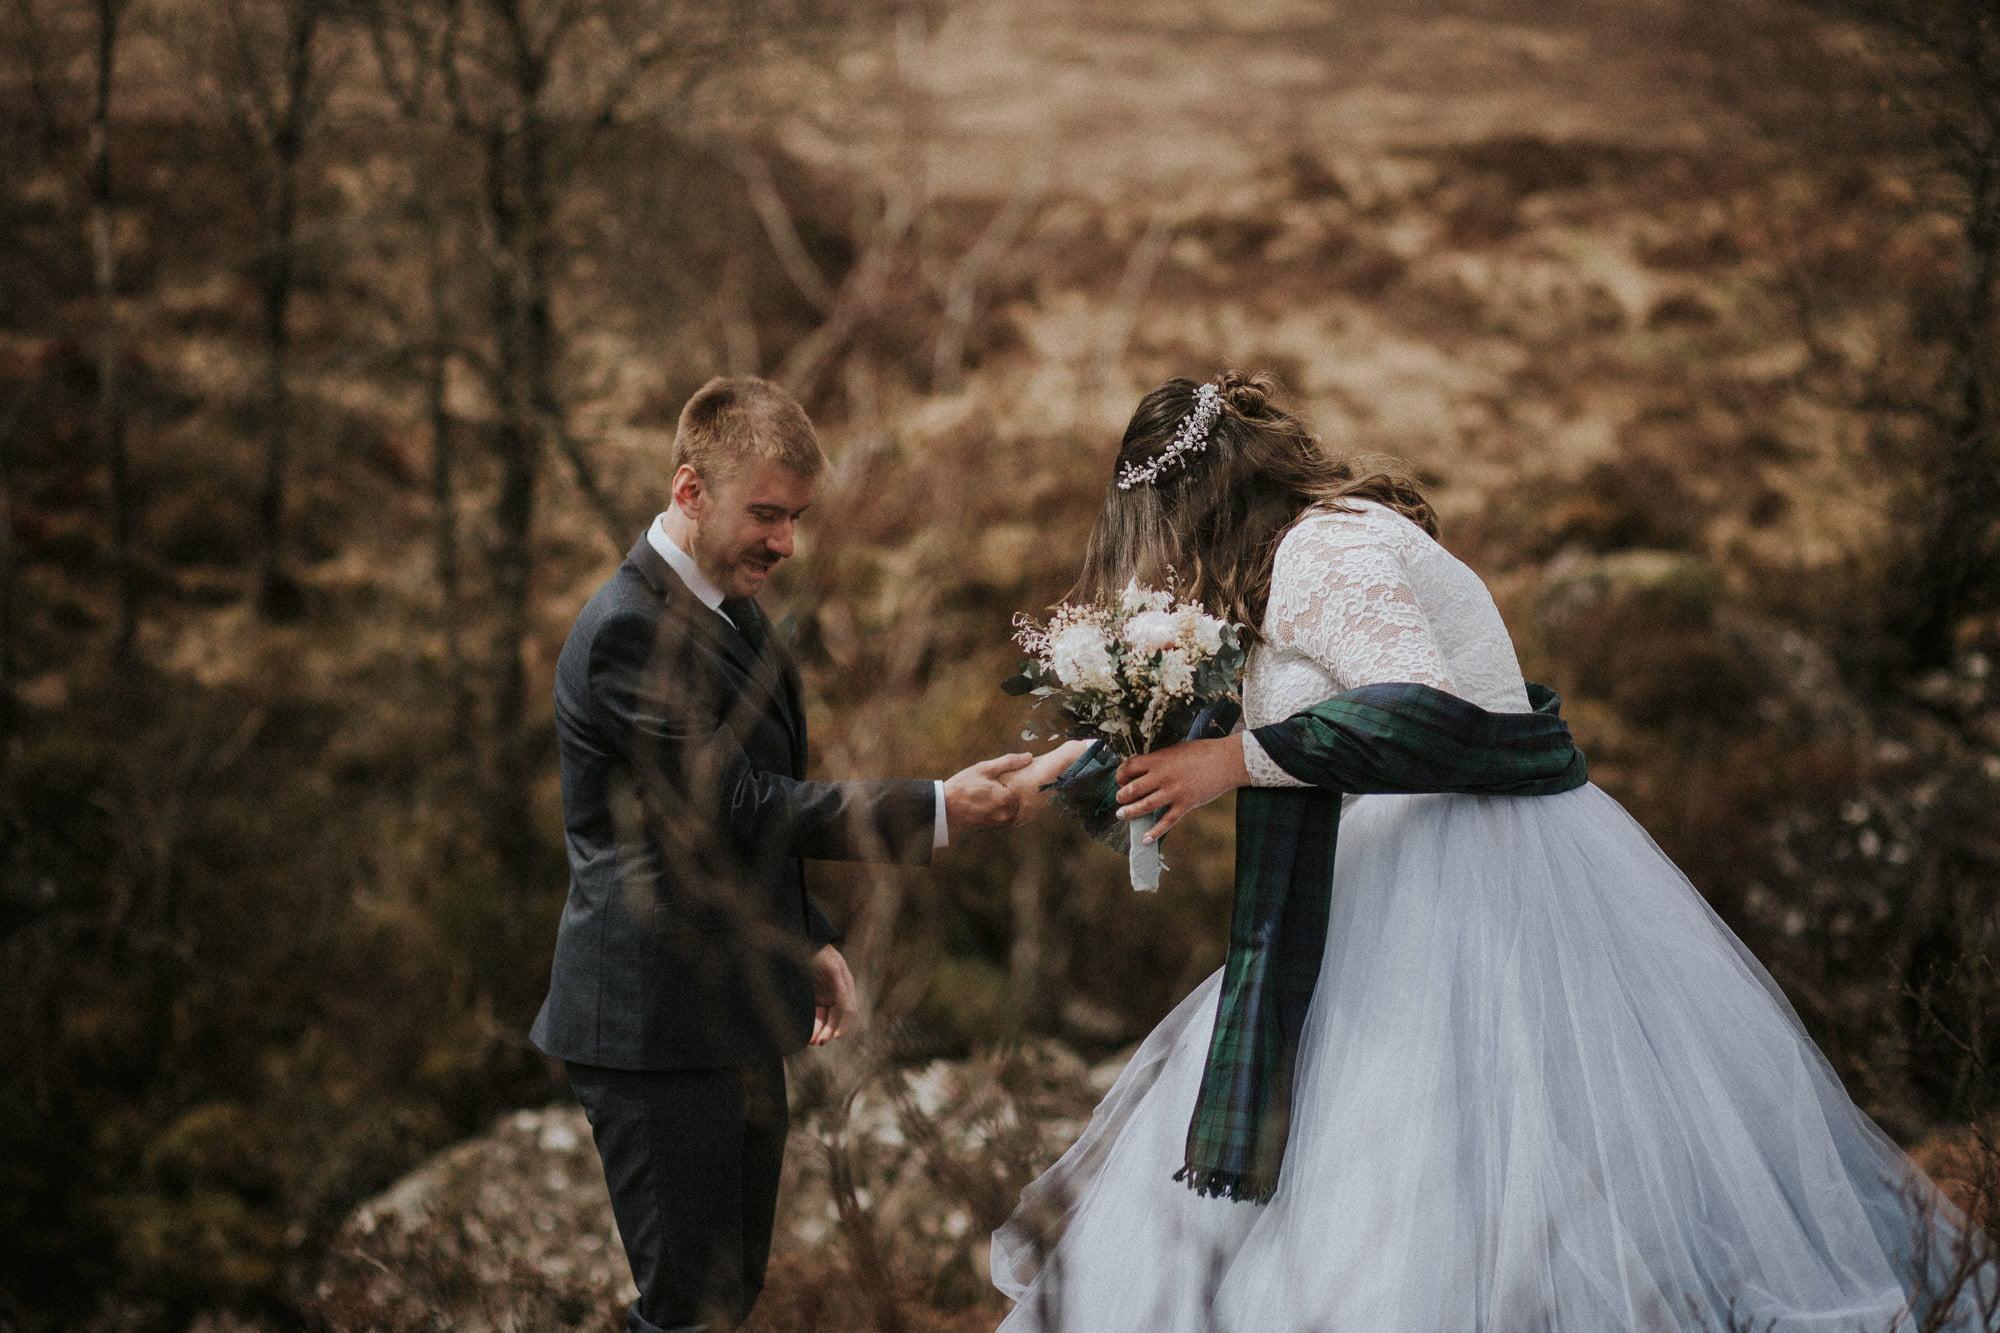 Elopement in Glencoe, Scotland. Intimate wedding in Scotland, Kingshouse Hotel Glencoe wedding, Glen Etive elopement